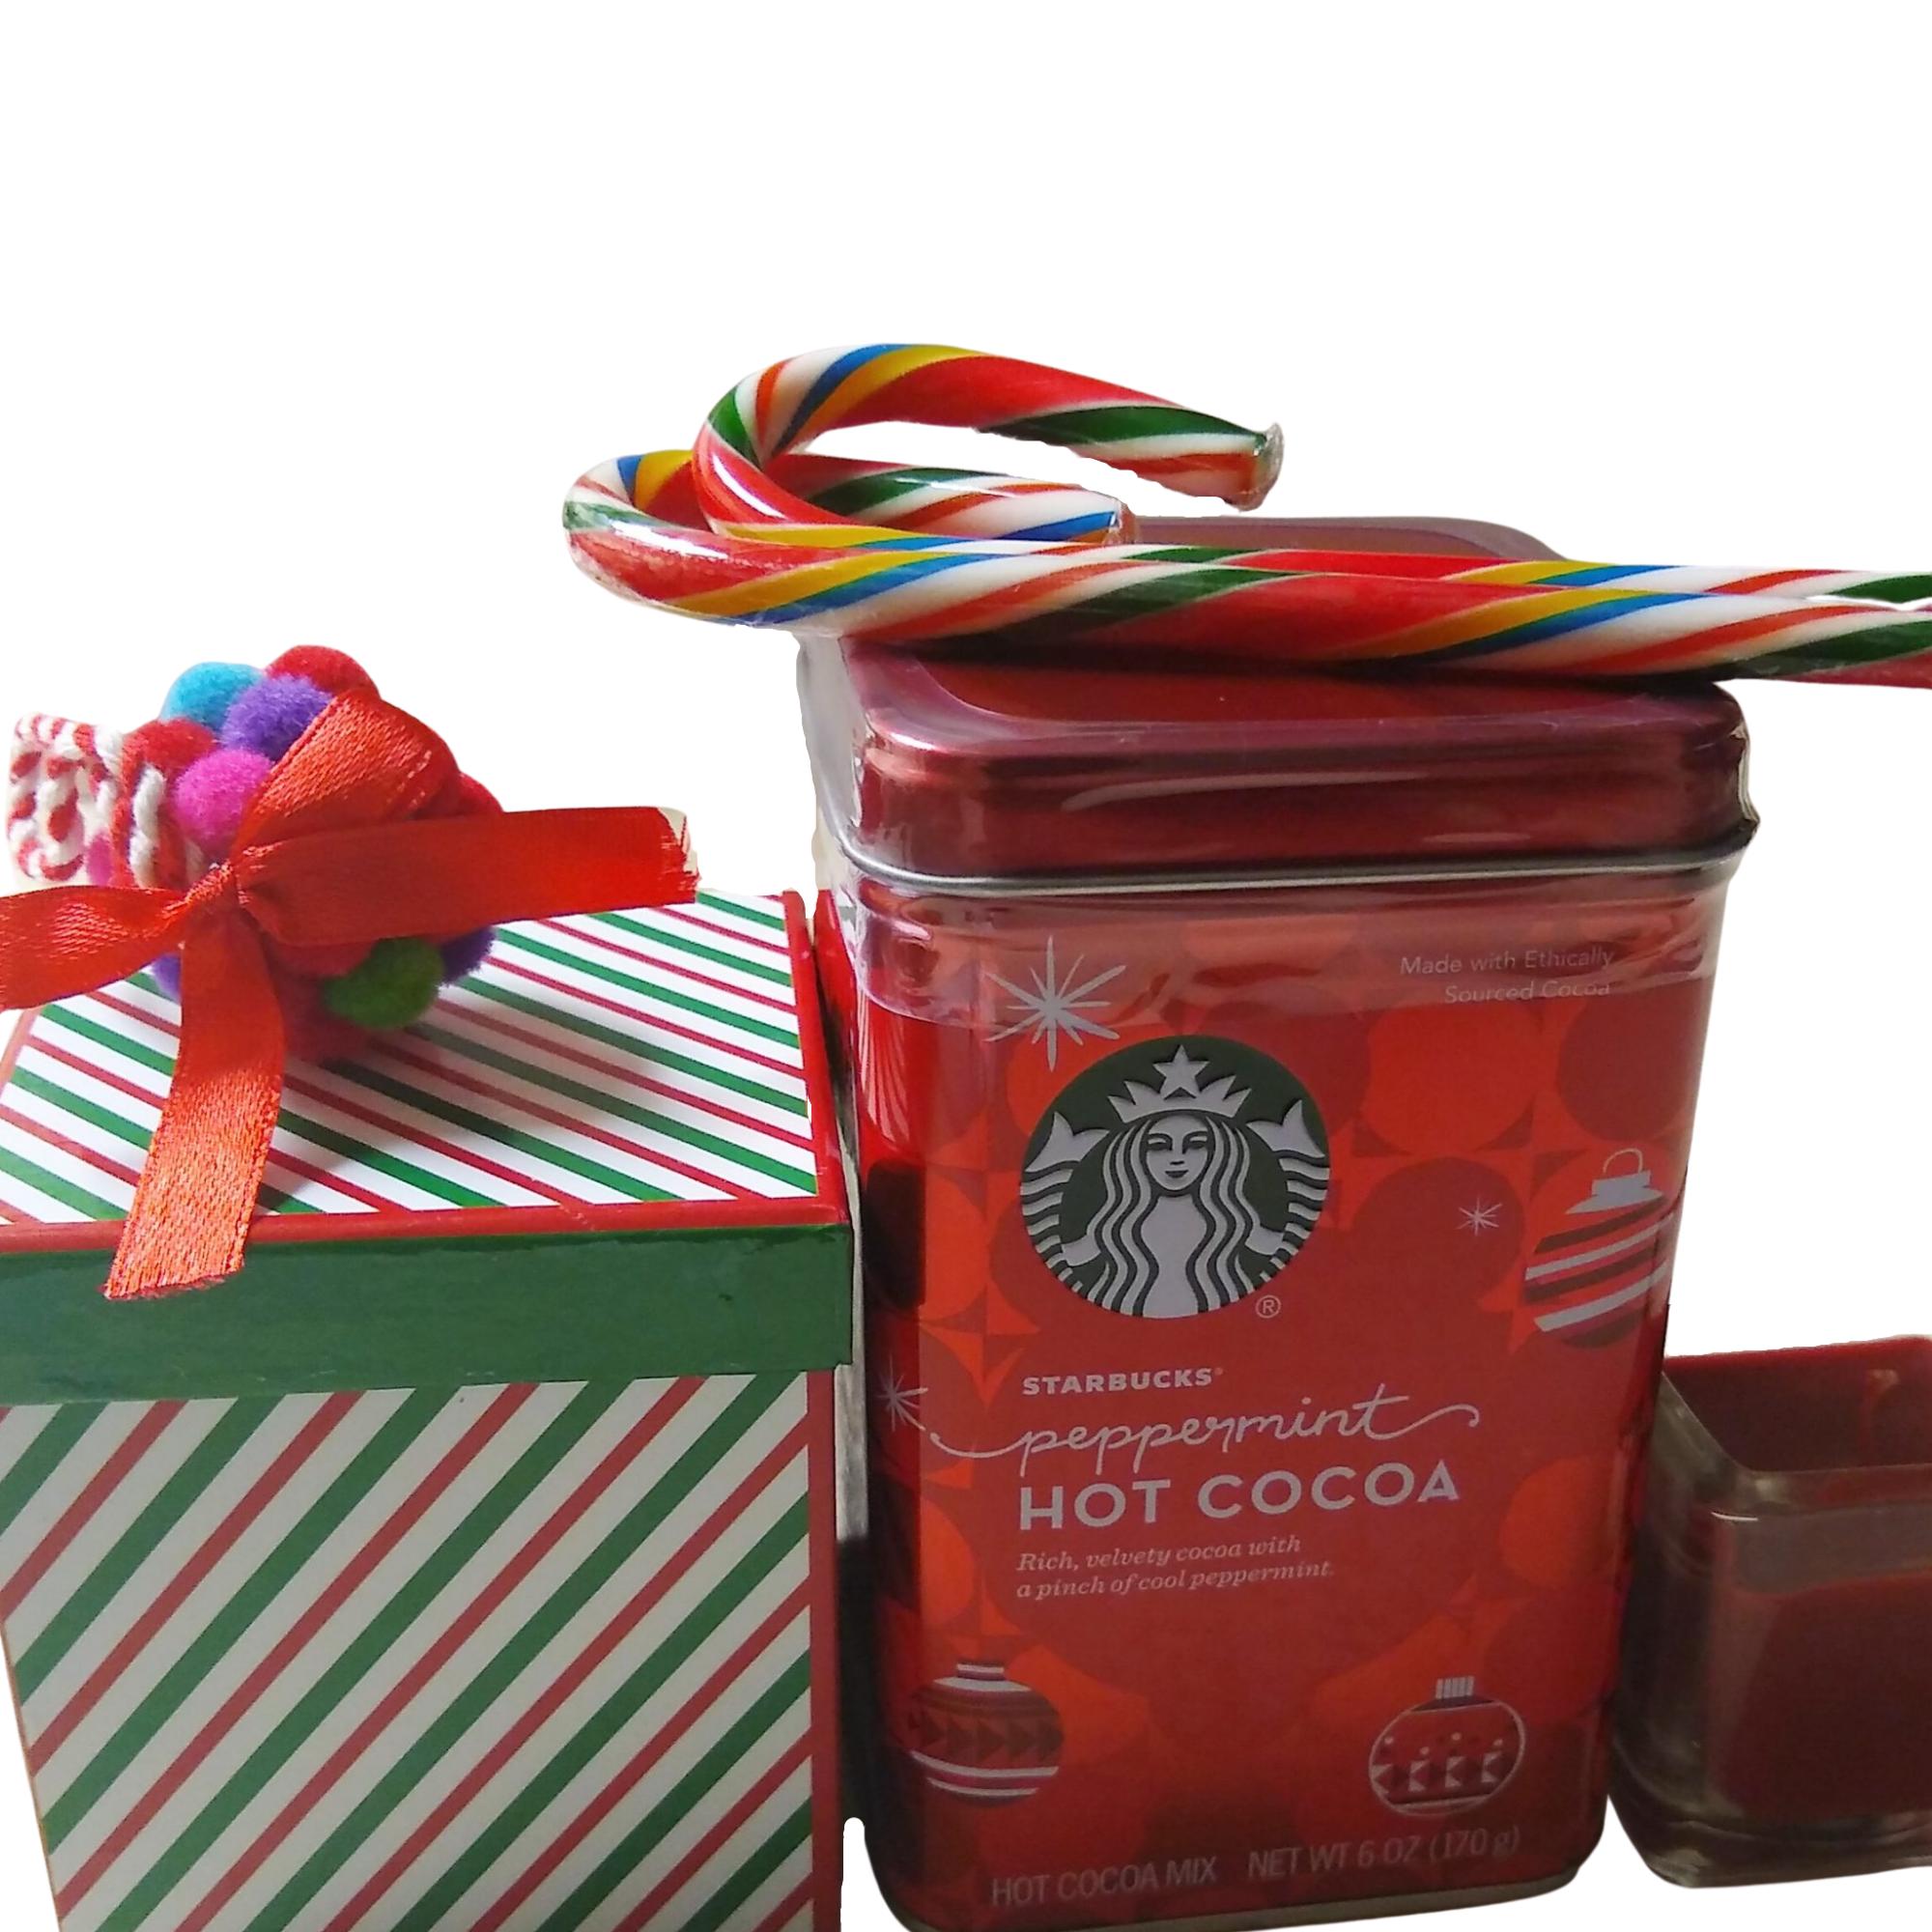 Striped Holiday Pom Pom Box Set with Starbucks Cocoa